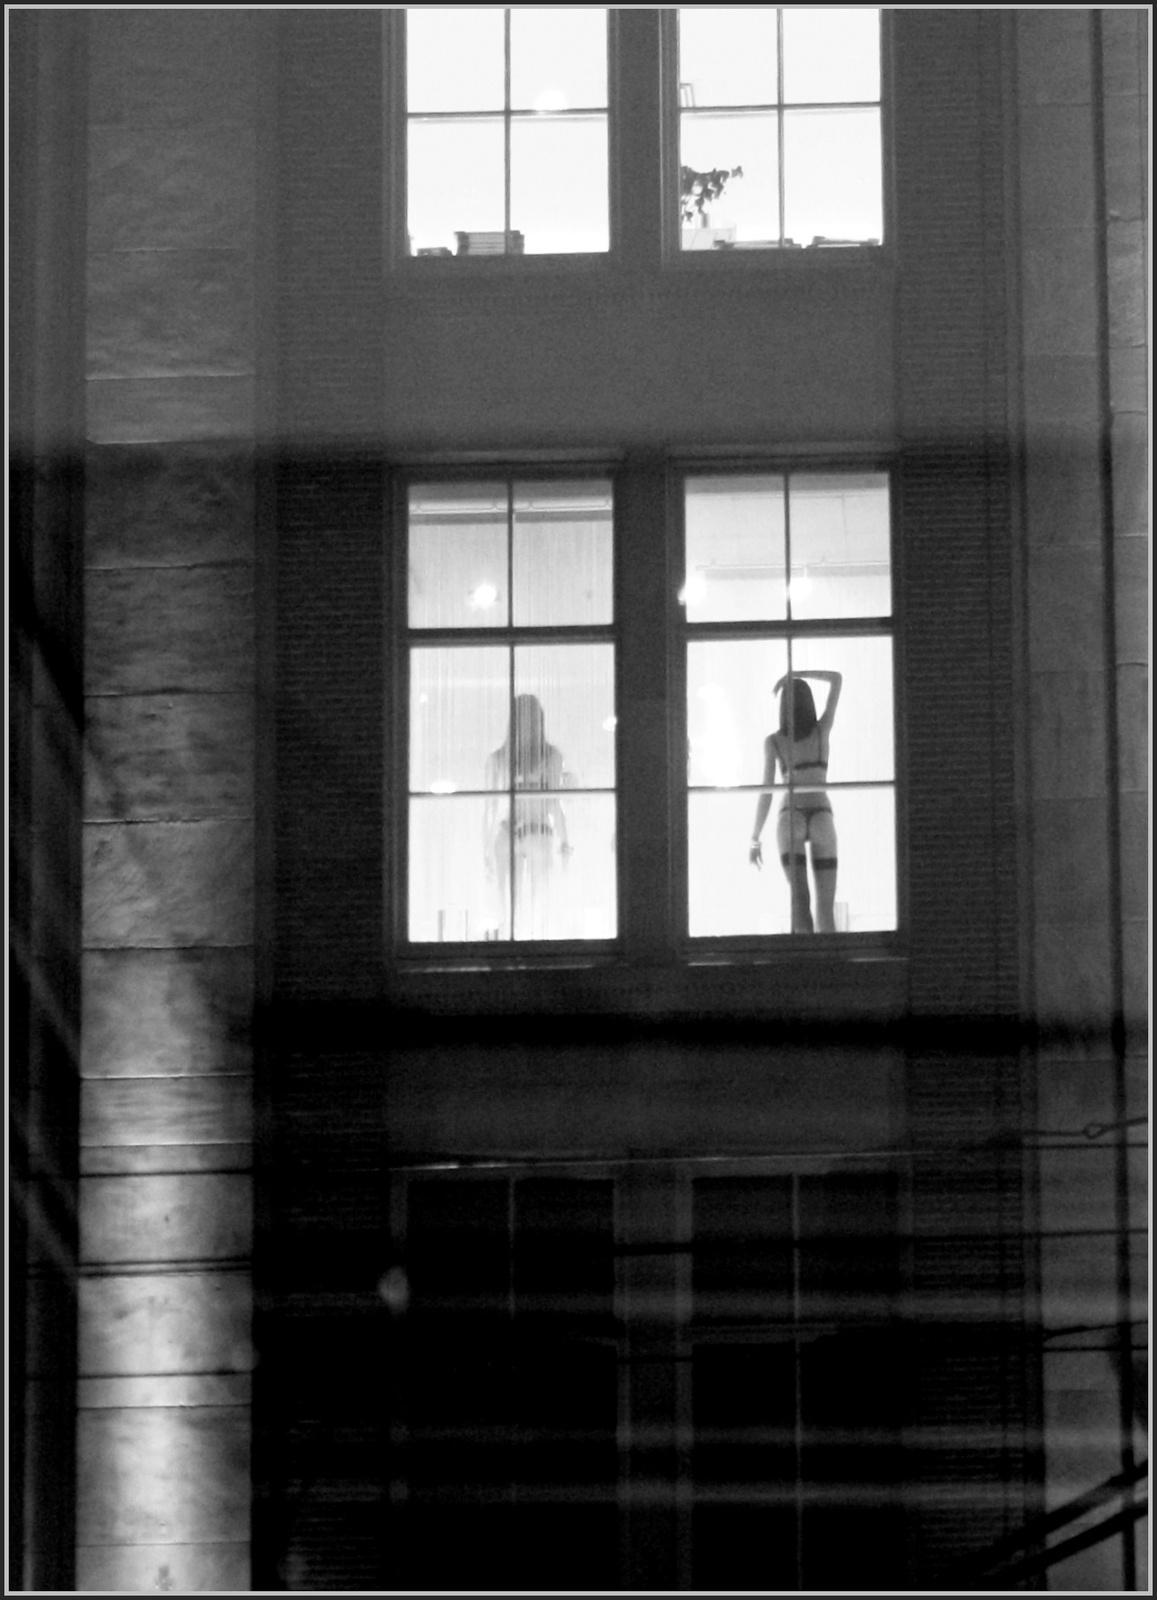 Amsterdami ablakok